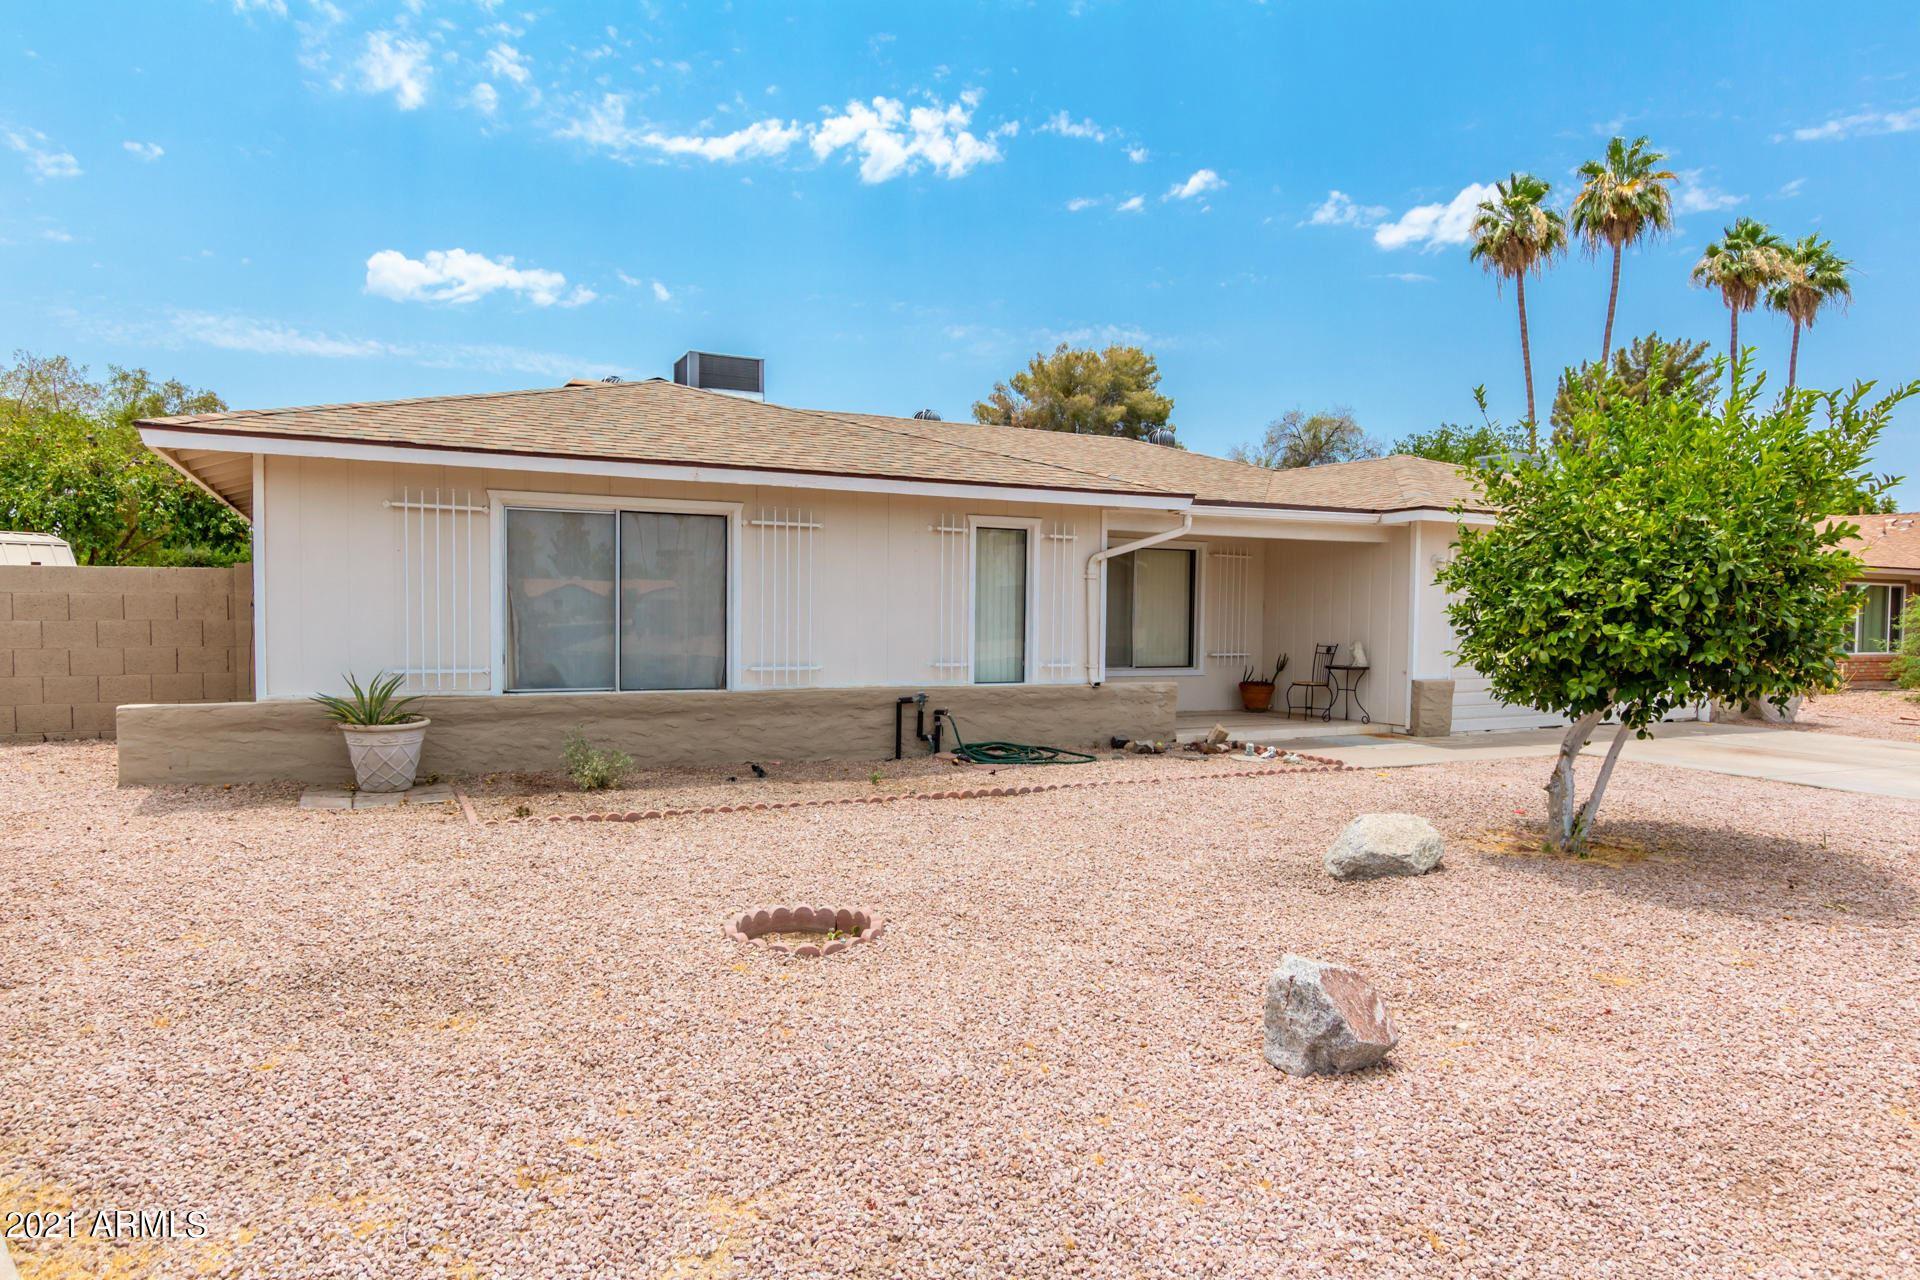 2343 E LOMA VISTA Drive, Tempe, AZ 85282 - MLS#: 6253015